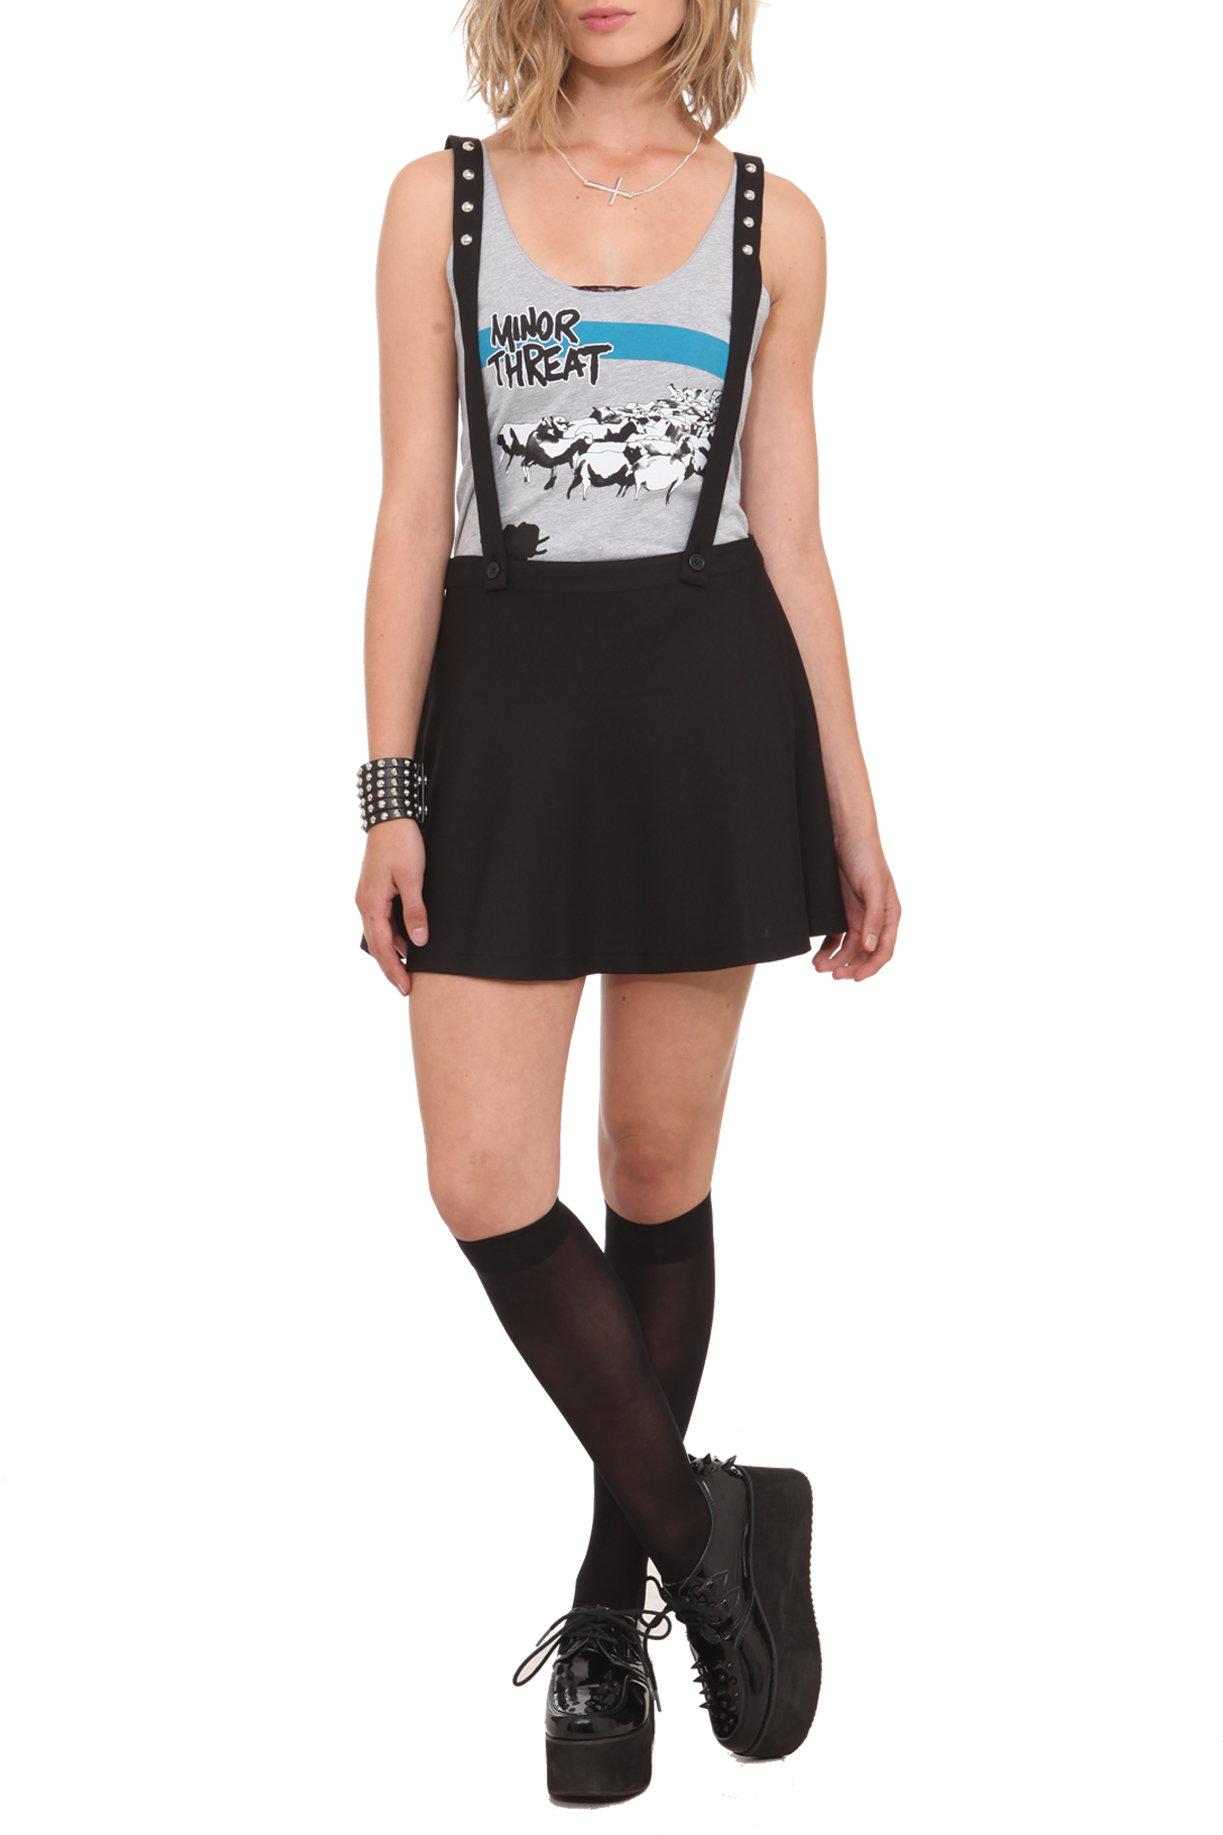 #hottopic.com             #Skirt                    #Royal #Bones #Black #Suspenders #Skirt #Topic      Royal Bones Black Suspenders Skirt   Hot Topic                                http://www.seapai.com/product.aspx?PID=136806